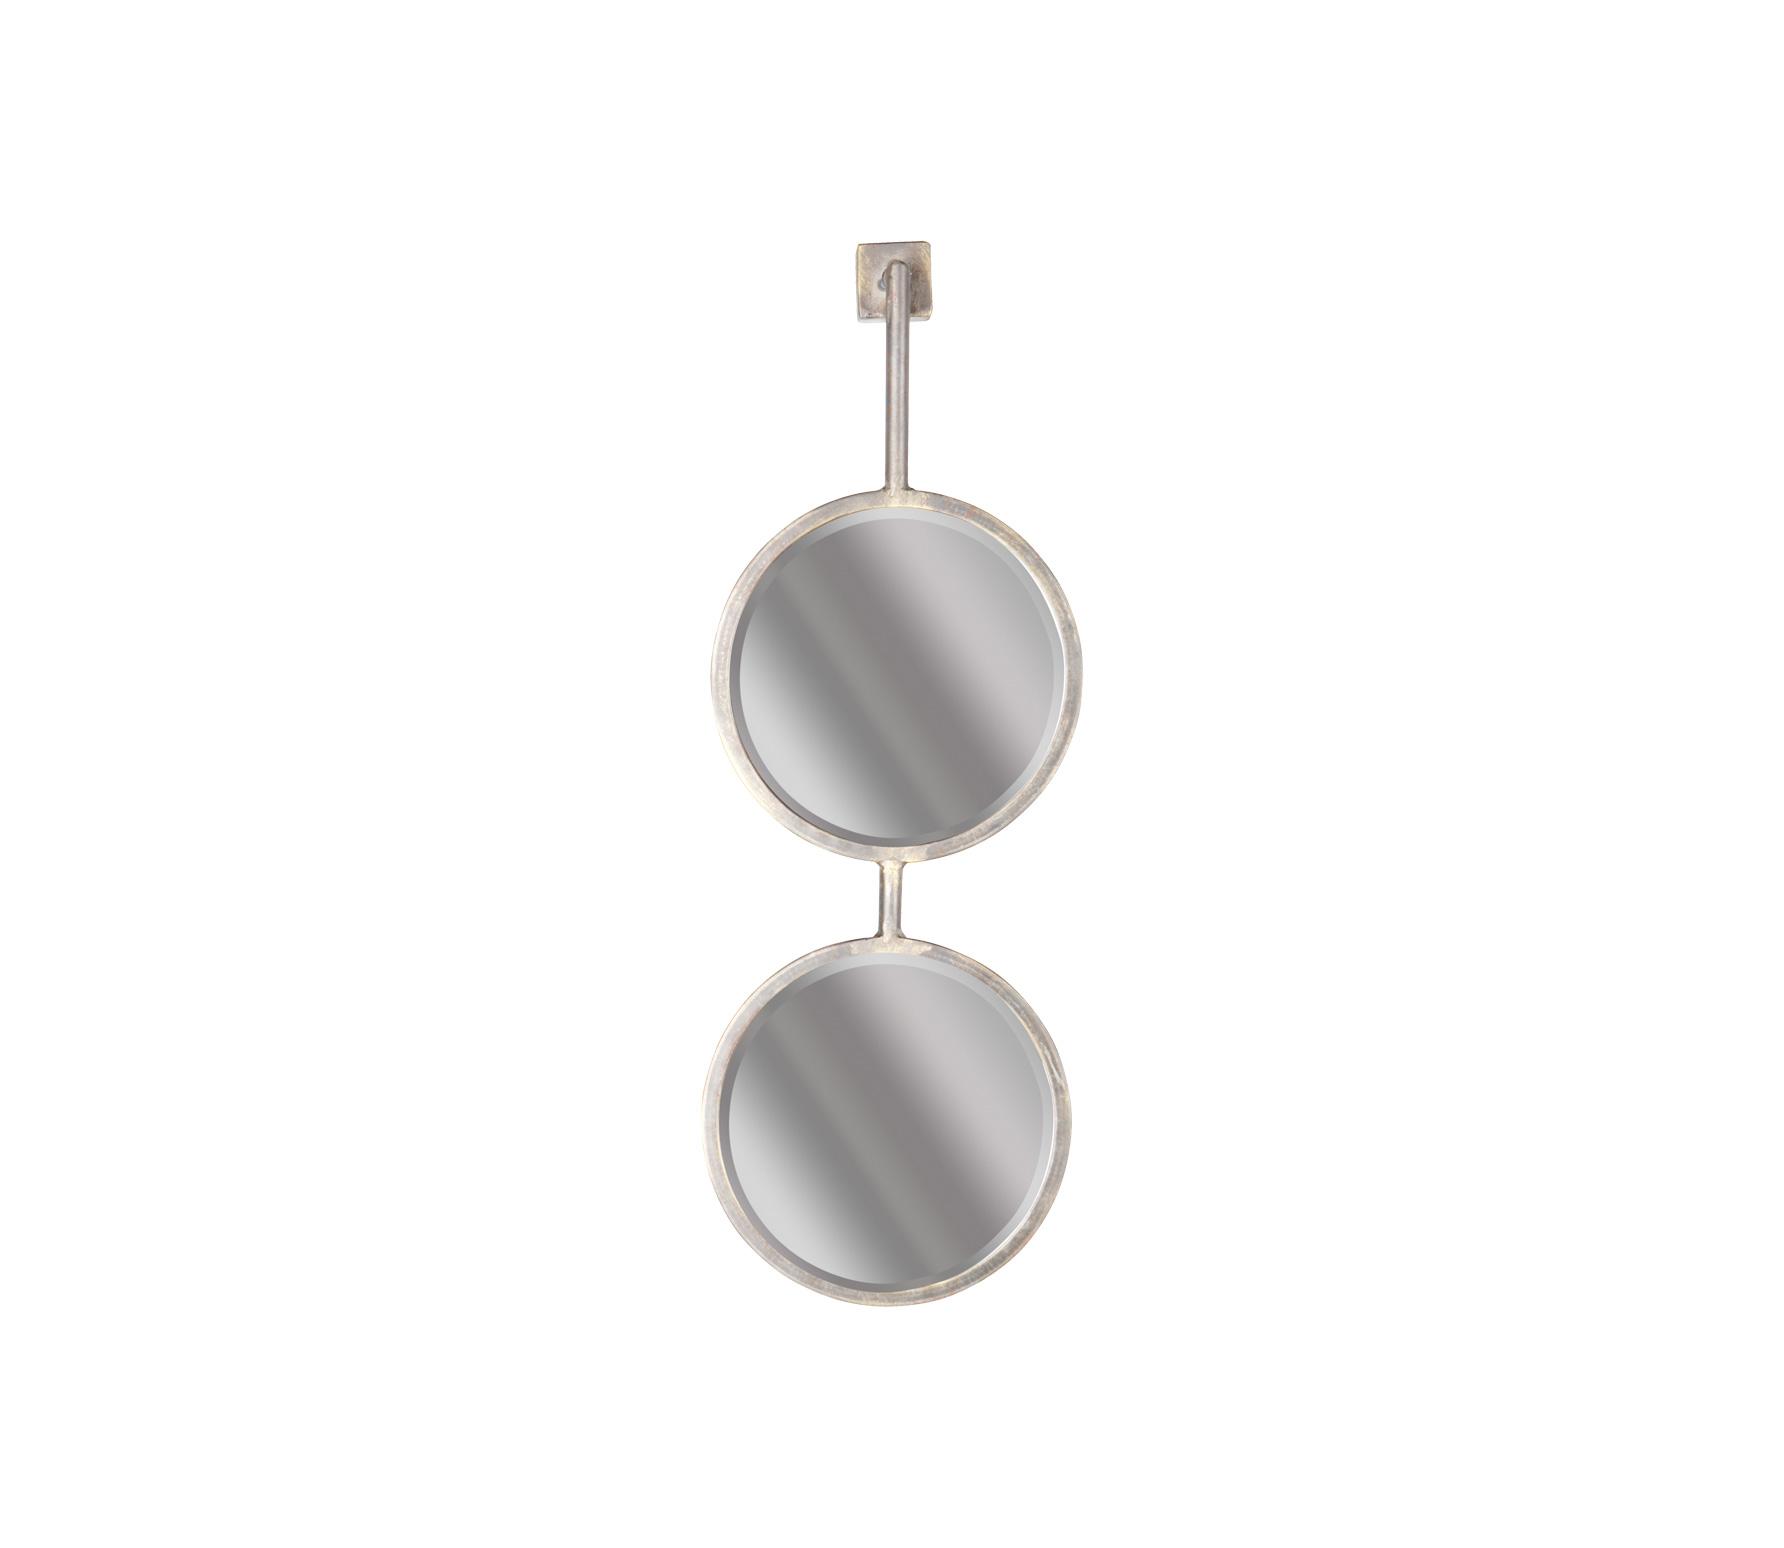 BePureHome Chain dubbele spiegel M antique zwart vrijstaand